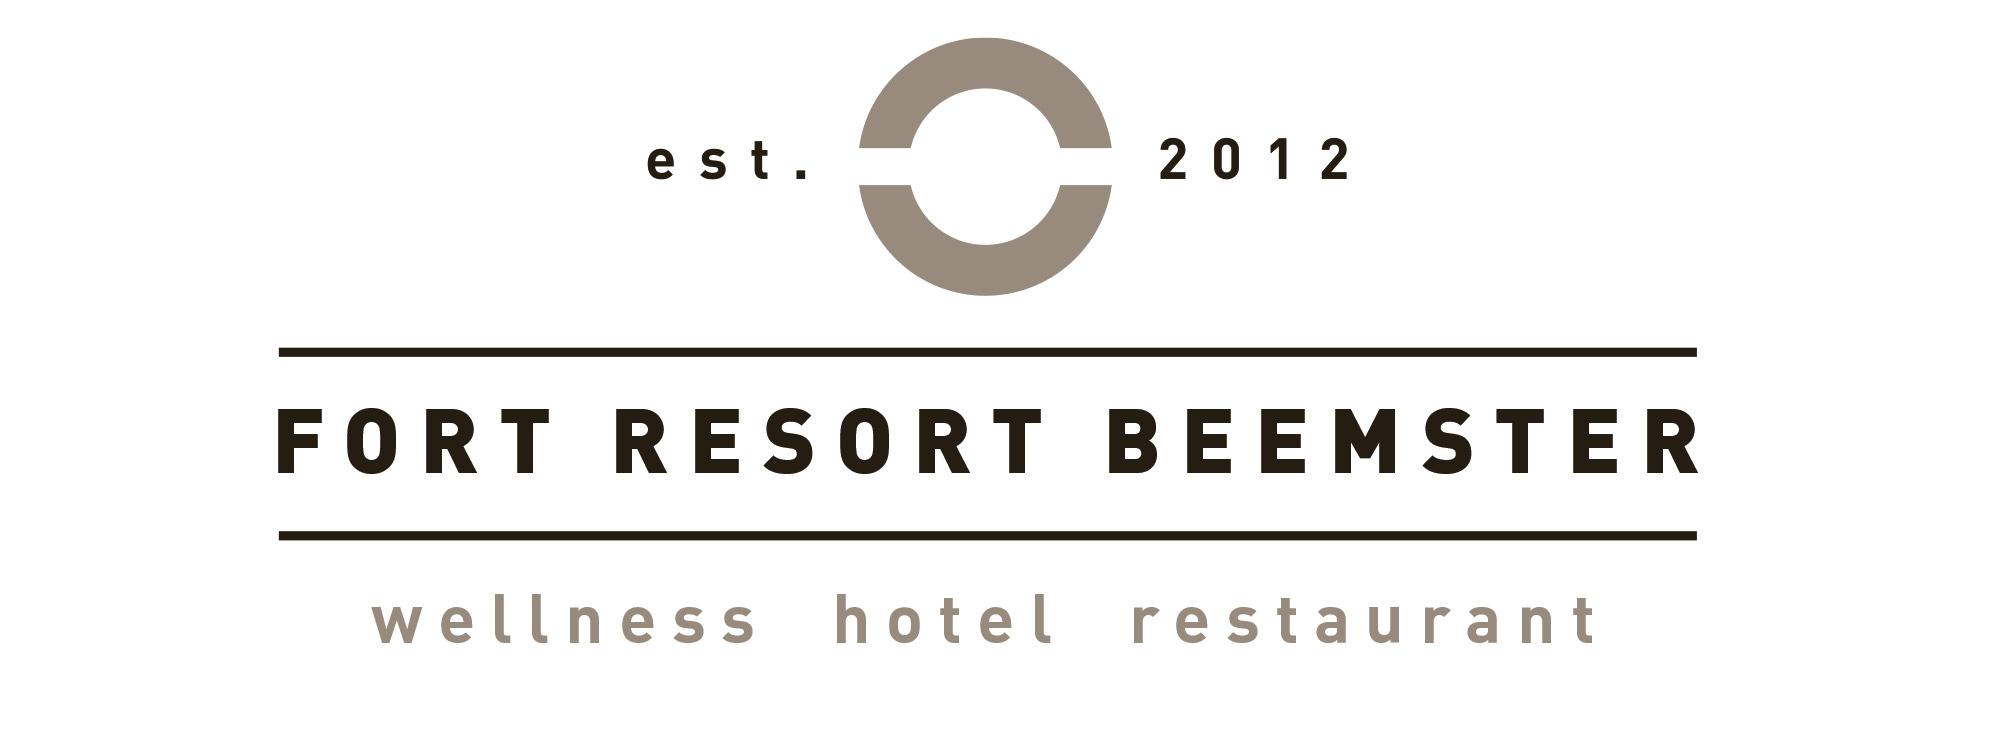 Fort Resort Beemster logo